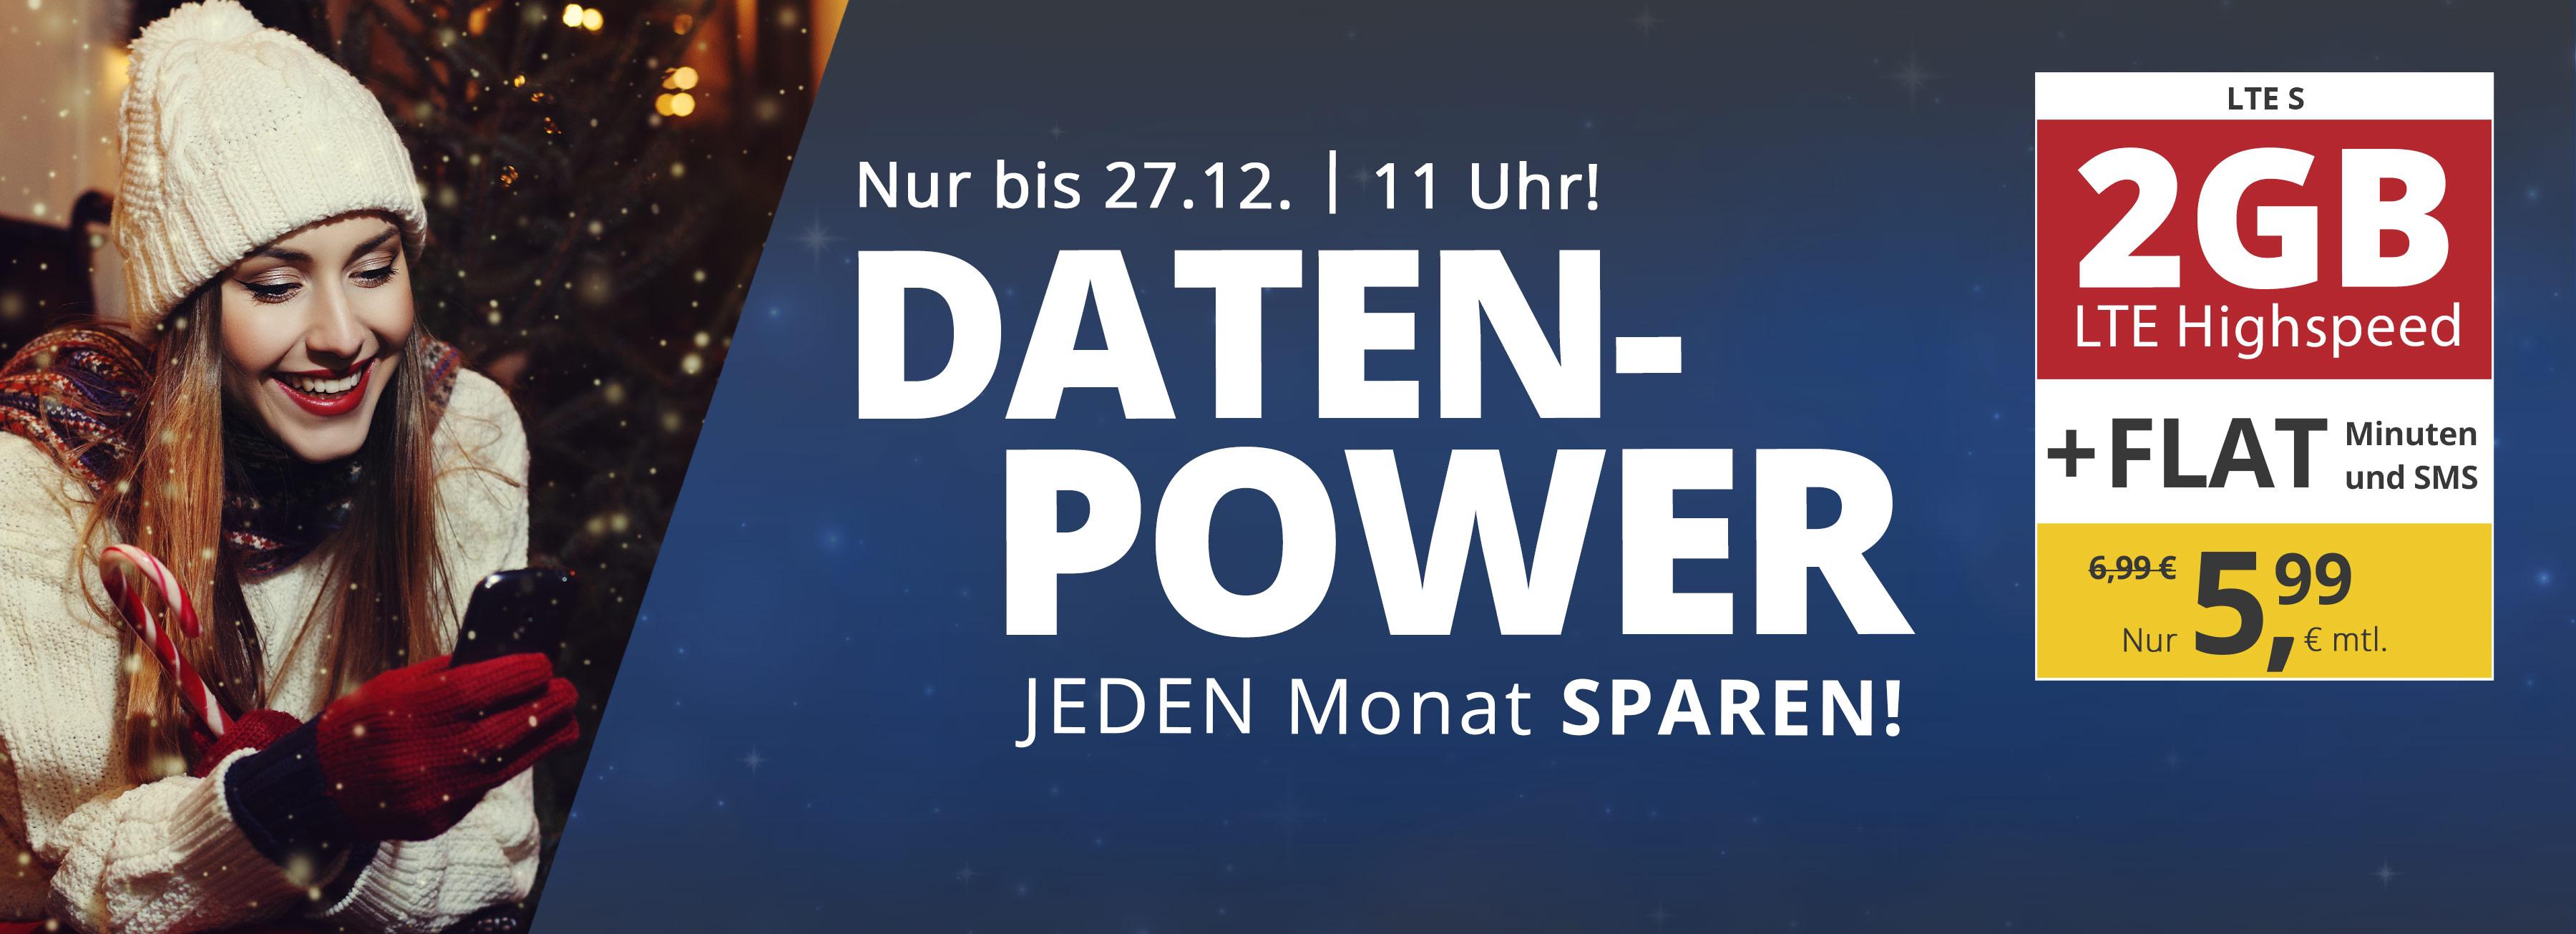 Monatlich kündbar:PremiumSIM Tarif mit 2GB LTE, Allnet- & SMS-Flat für mtl. 5,99€ + 9,99€ AG(o2-Netz)